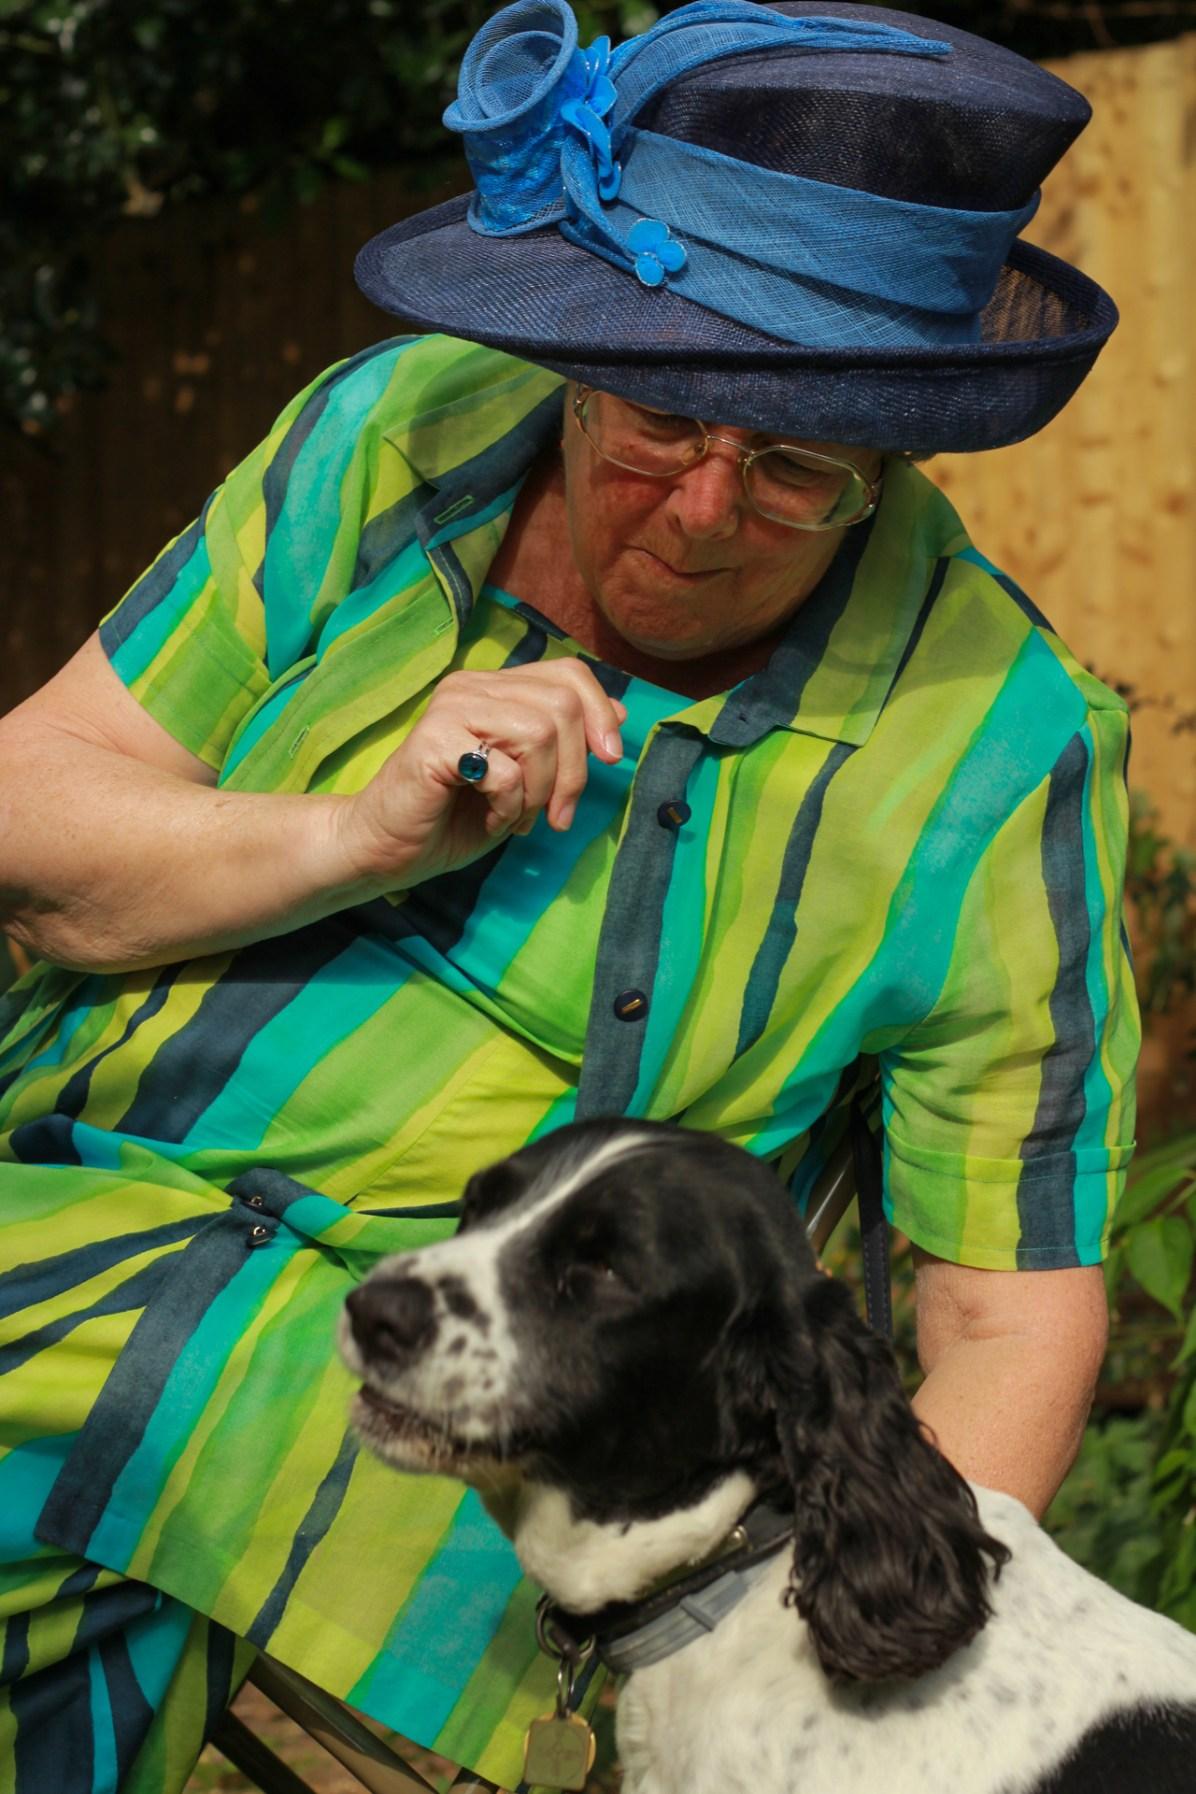 Lily, vicar Sally's spaniel, enjoys a cake with Johanna Raffin.